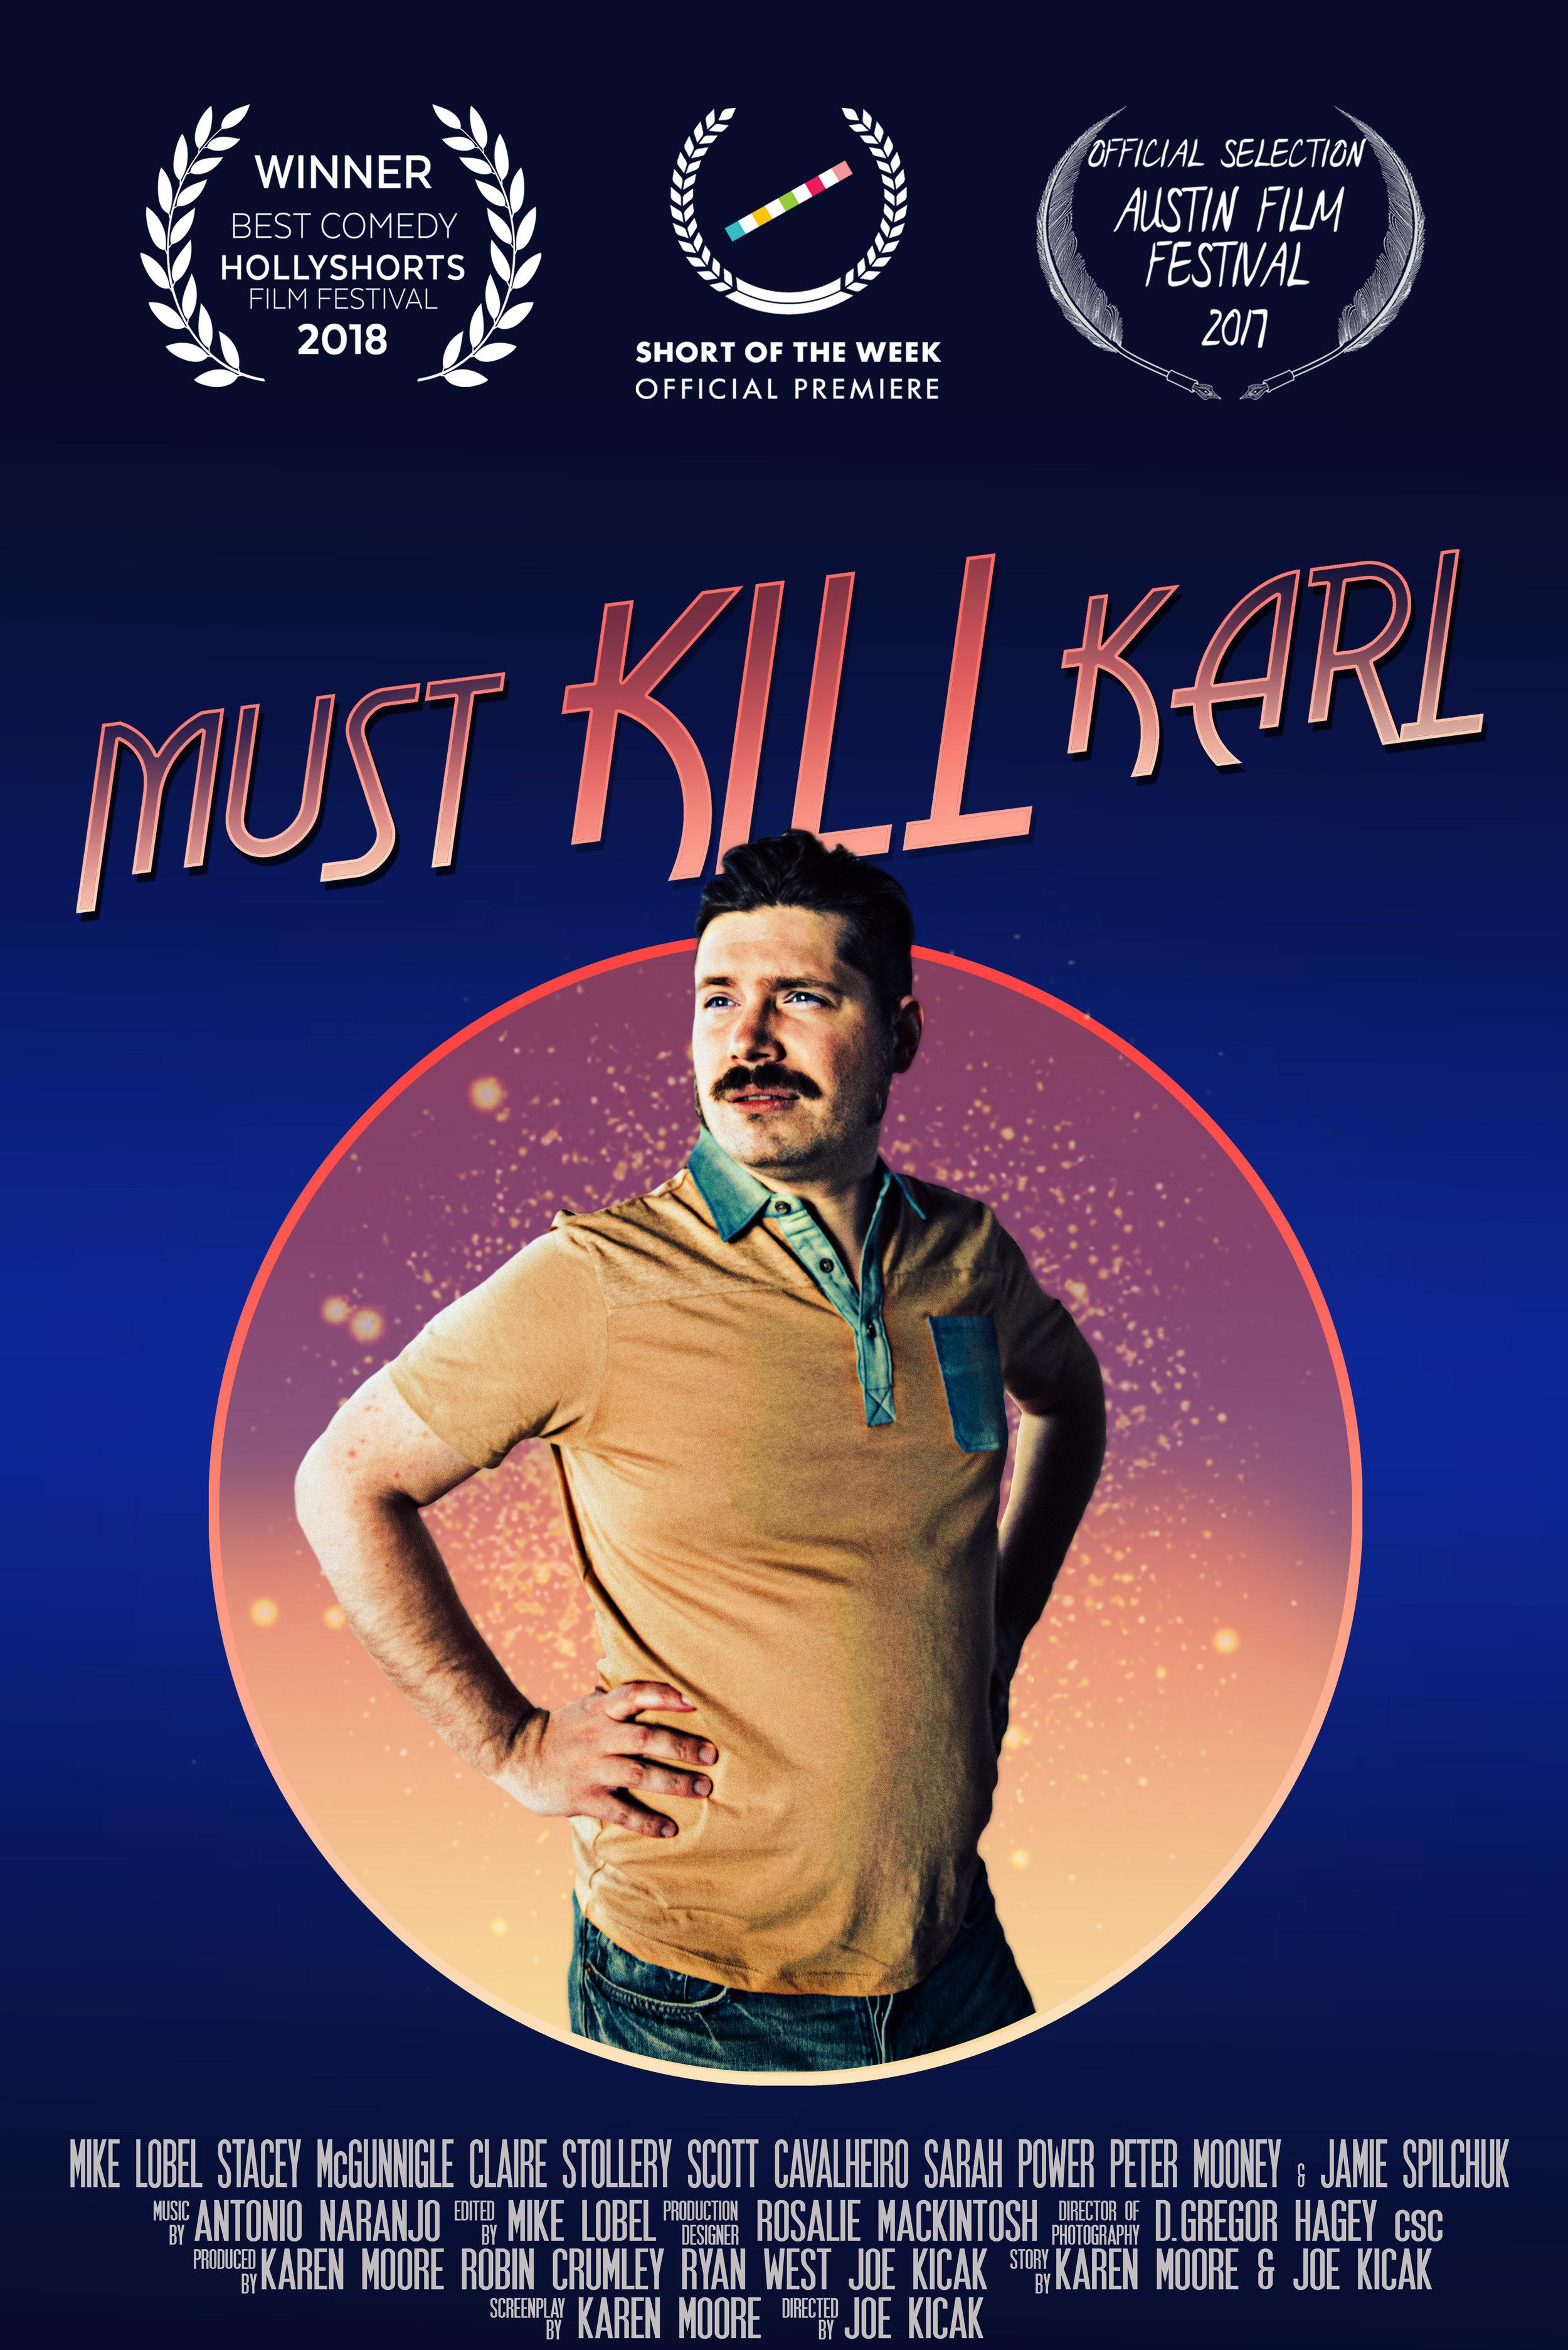 MUST KILL KARL - COMEDY 12 MIN. / BRAVO!FACT / CBCDIRECTOR: JOE KICAKWRITER: KAREN MOOREPRODUCERS: KAREN MOORE, JOE KICAK, RYAN WEST, ROBIN CRUMLEYOFFICIAL SELECTION:*AUSTIN FILM FESTIVAL, CINEQUEST FILM FESTIVAL, BROOKLYN FILM FESTIVAL, HOLLYSHORTS FILM FESTIVAL, SAN DIEGO INTERNATIONAL FILM FESTIVAL*SHORT OF THE WEEKSELECT AWARDS:*BEST COMEDY, HOLLYSHORTS FILM FESTIVAL, 2018*GOLDEN SHEAF WINNER, BEST COMEDY, YORKTON FILM FESTIVAL, 2018*BROADCAST ON CBC'S CANADIAN REFLECTIONSFILM WEBSITE: MUSTKILLKARL.COM